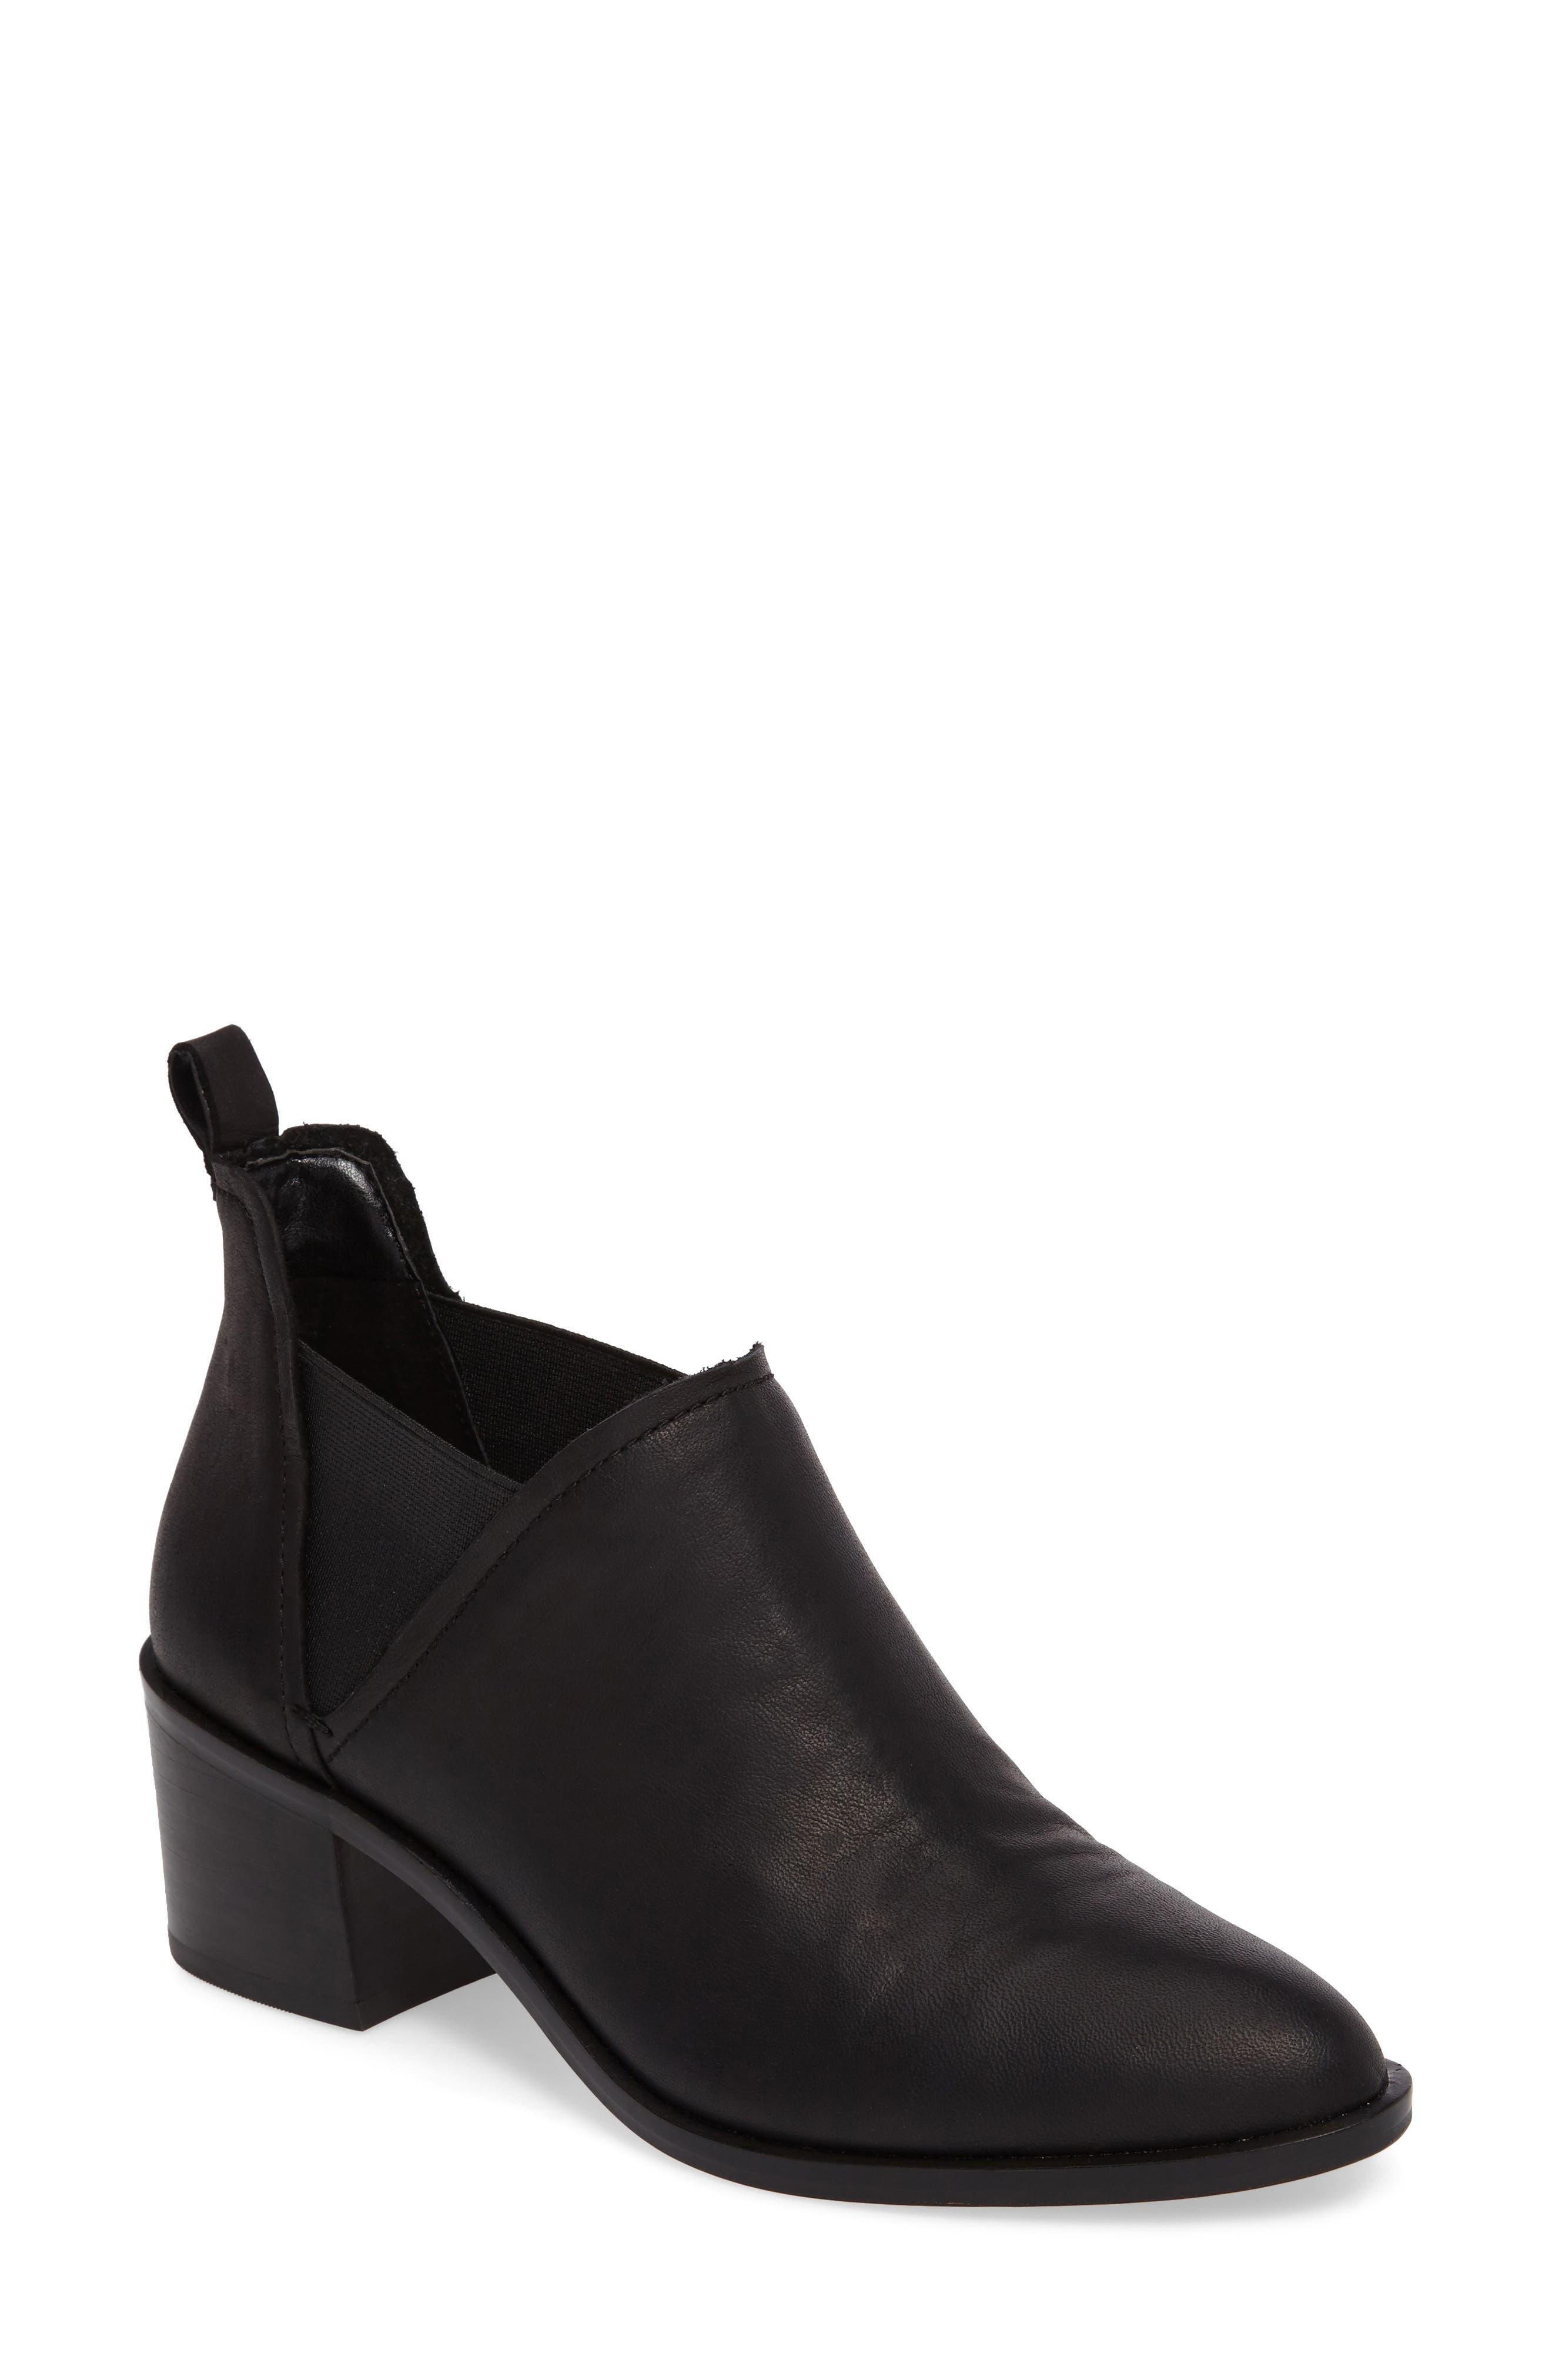 Alternate Image 1 Selected - 1.STATE Idrus Block Heel Boot (Women)